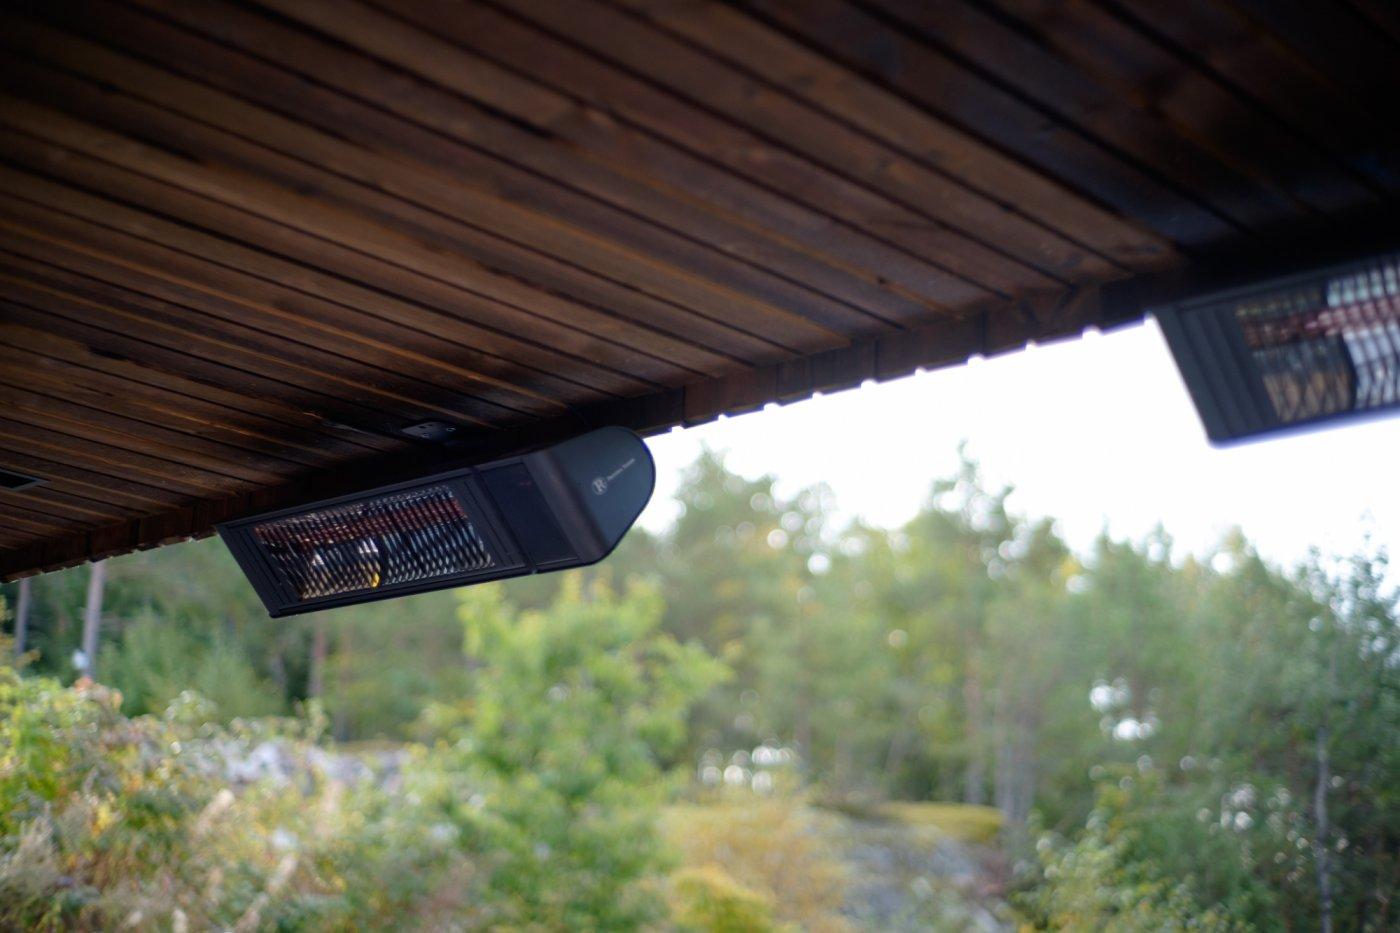 varmelampe ute under tak